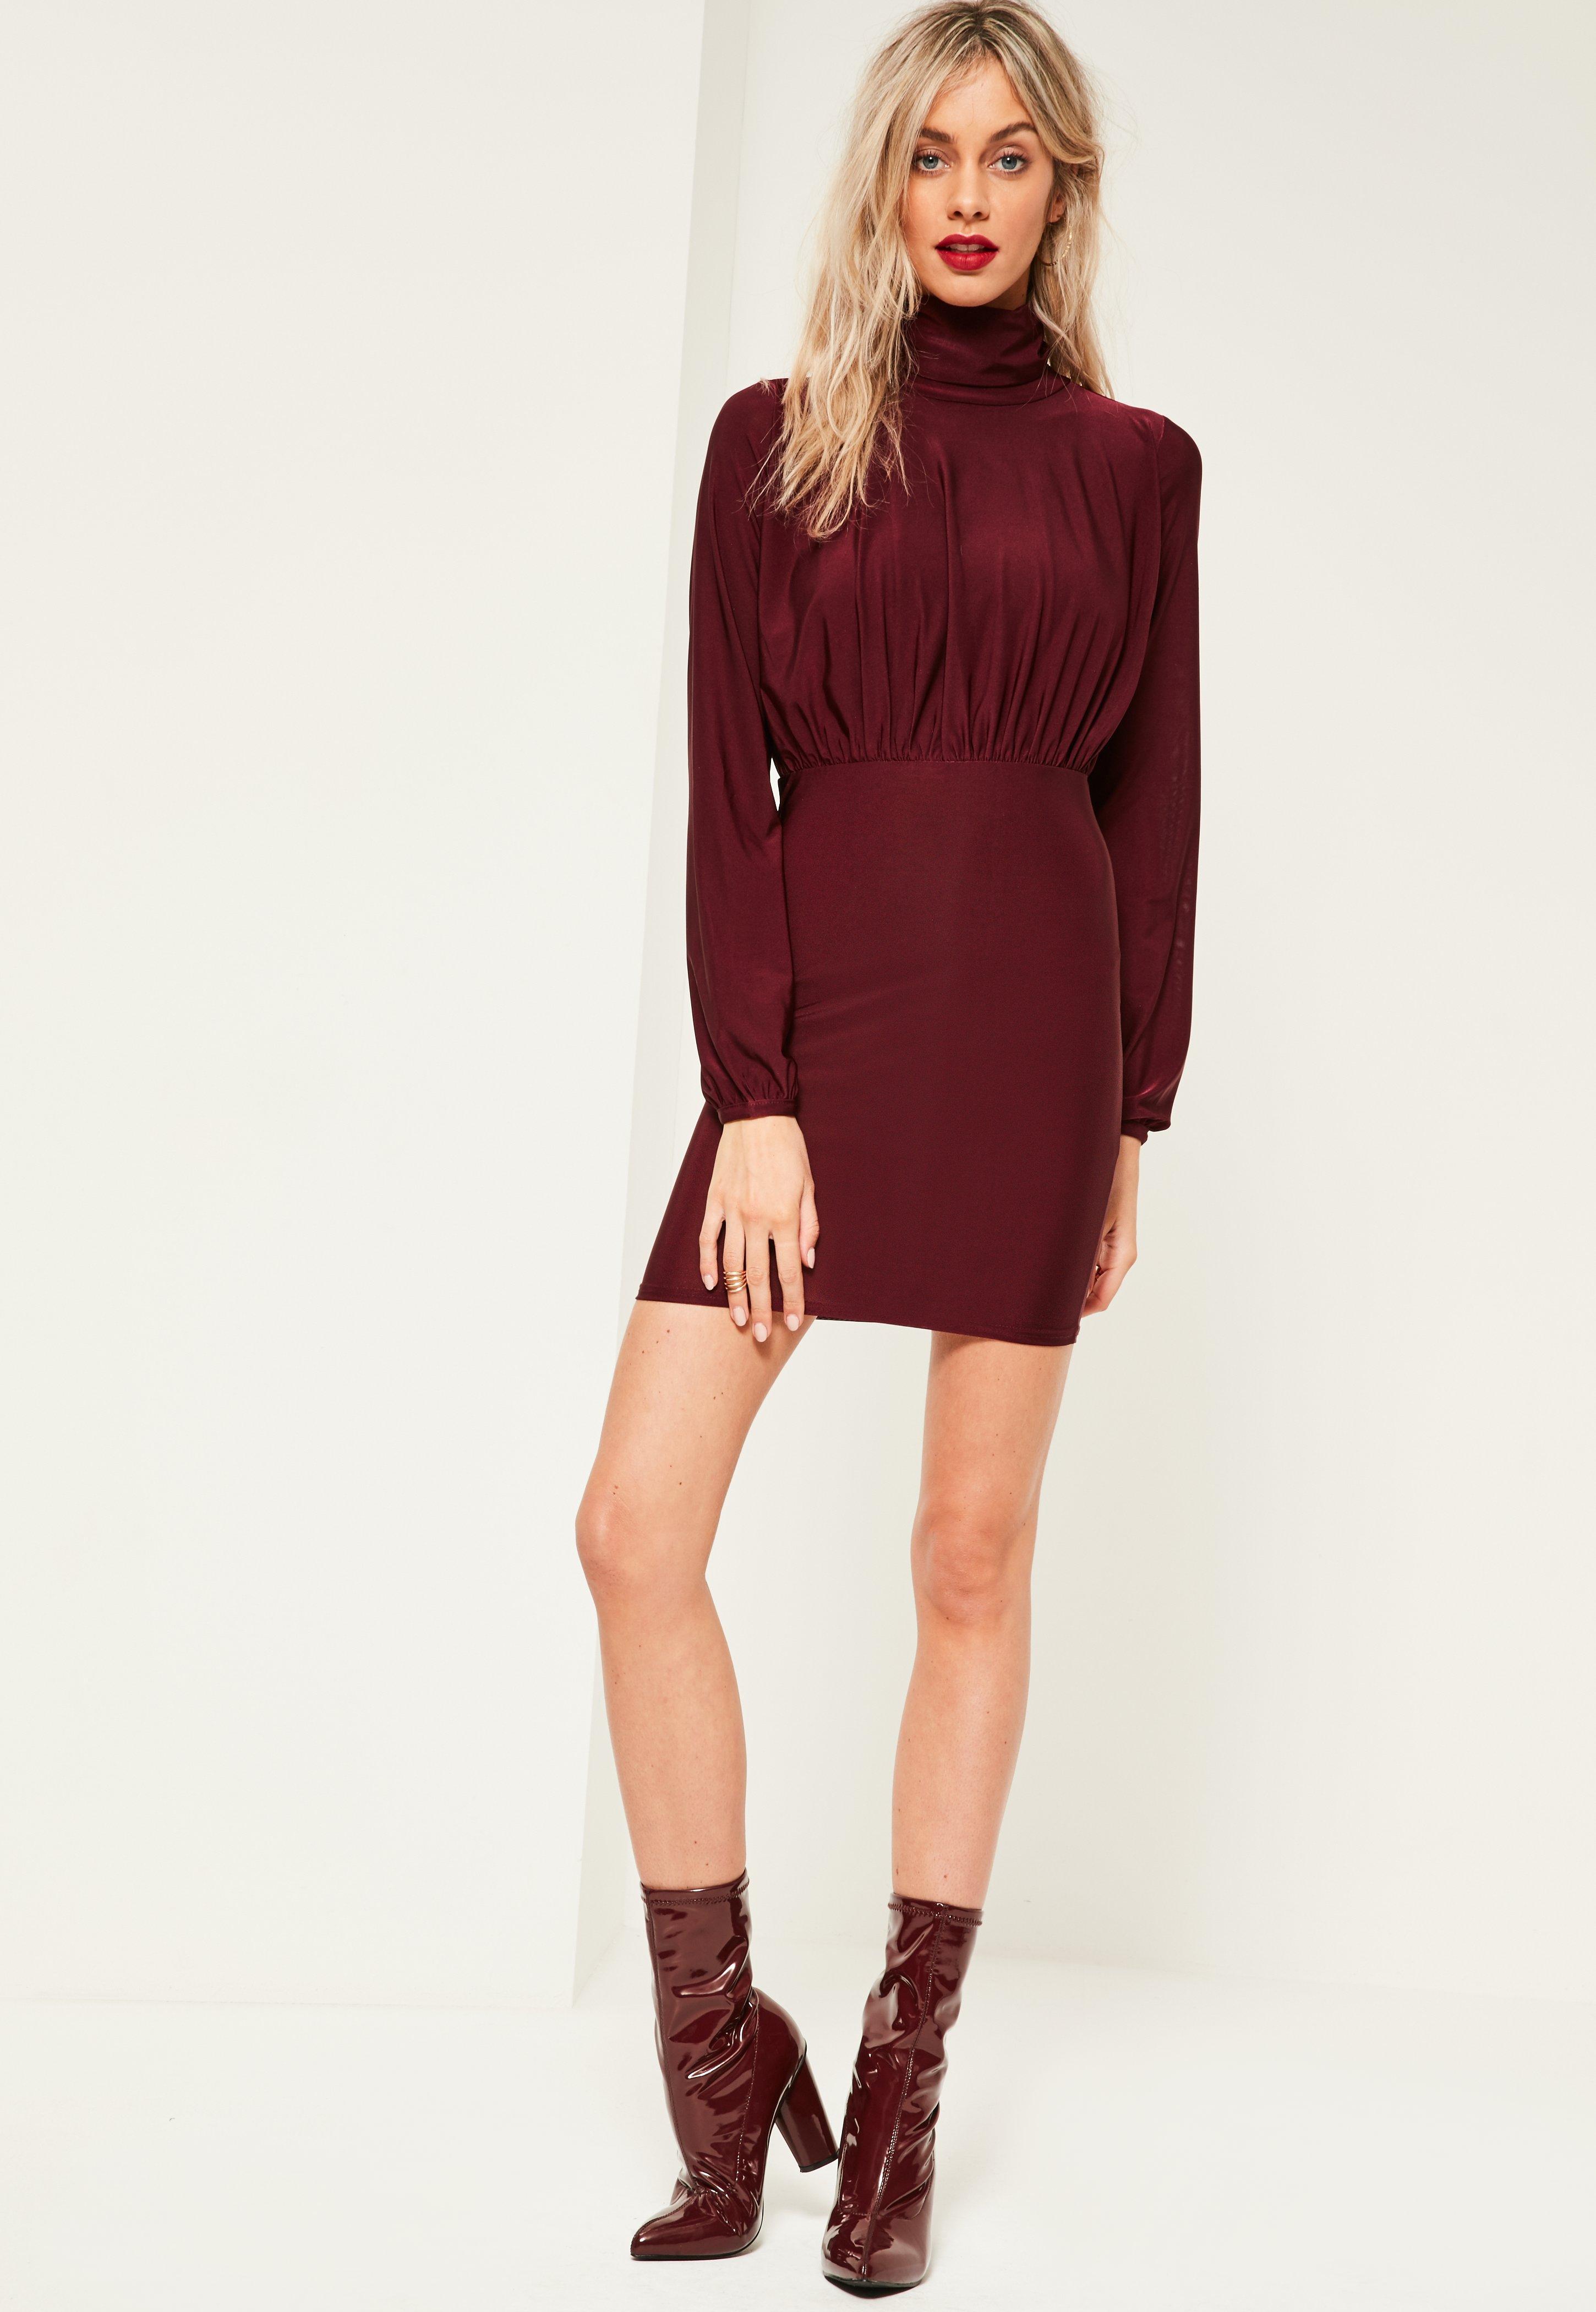 Burgundy Slinky High Neck Open Back Ruched Dress